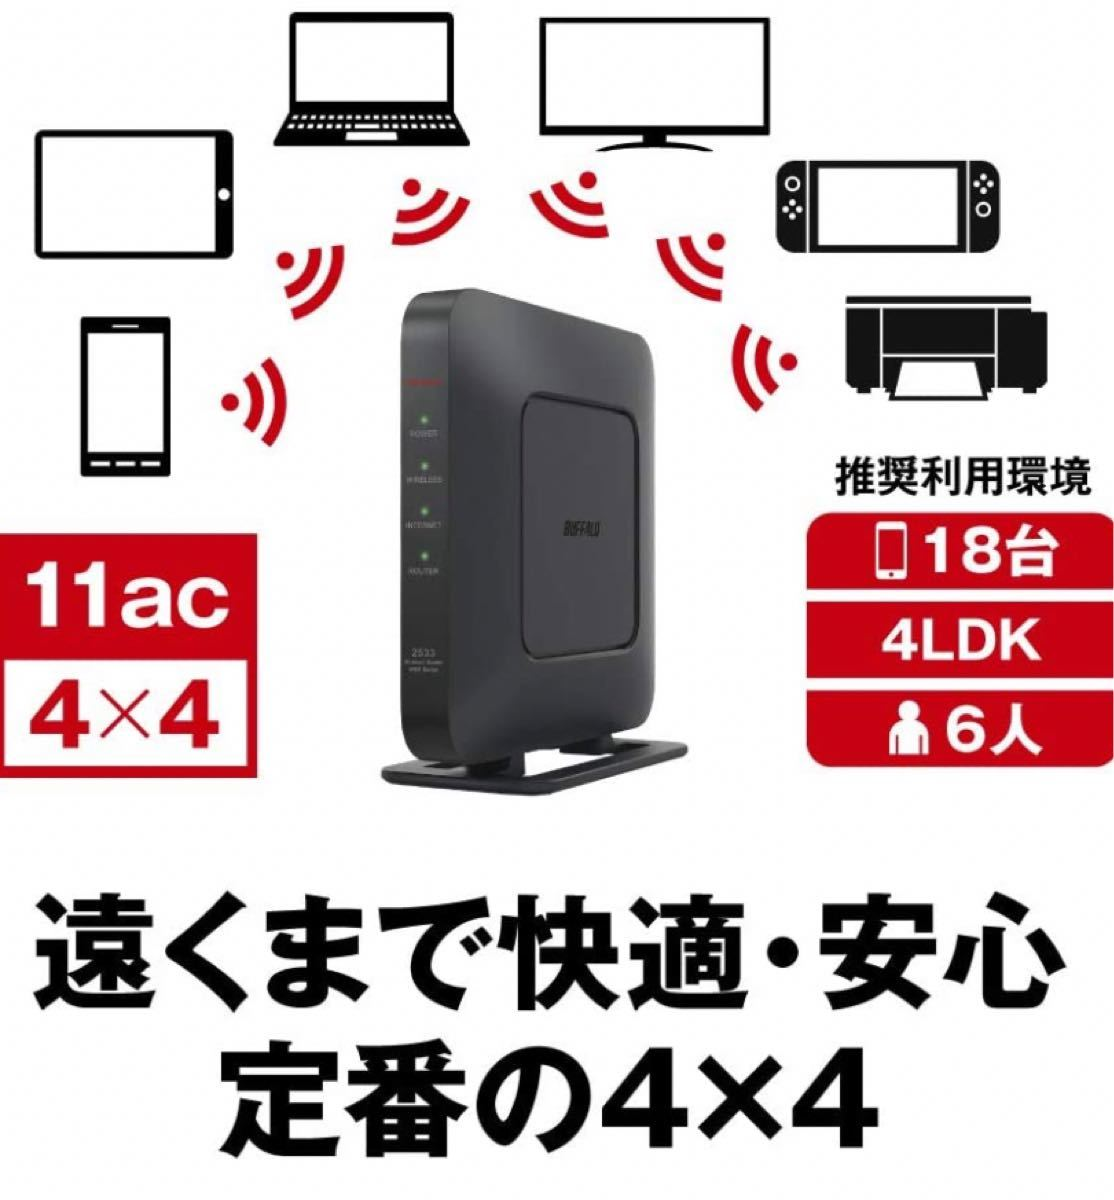 BUFFALO 無線LANルーター WiFi 11ac WSR-2533DHPL